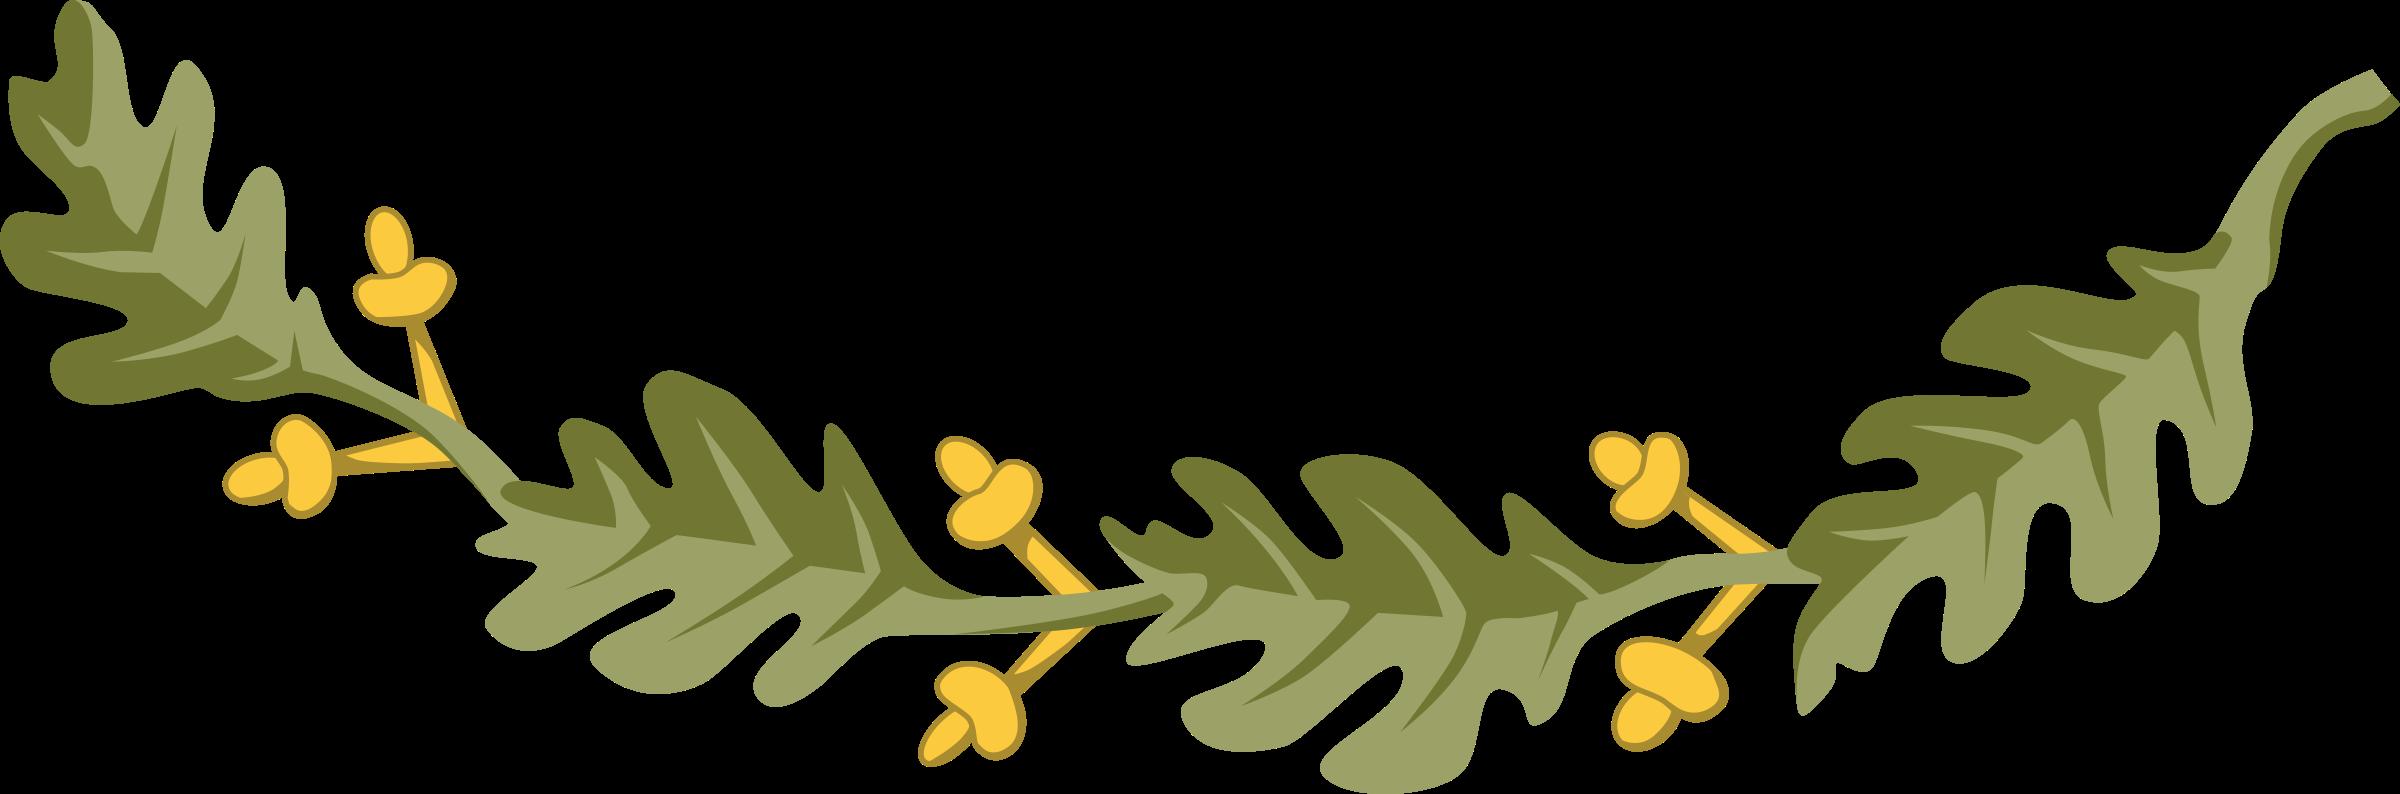 Oak big image png. 3 clipart branch